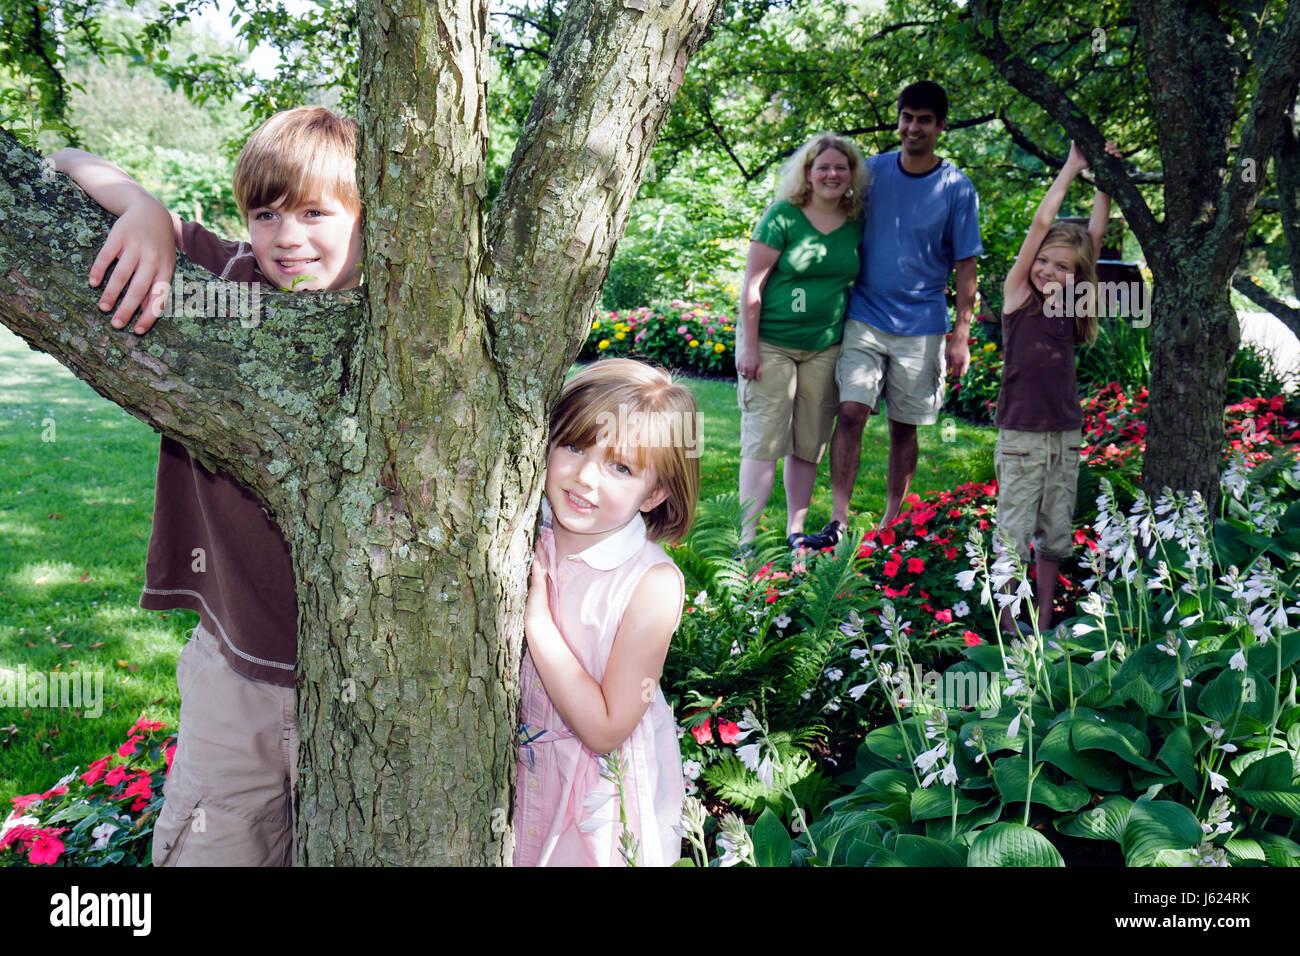 Indiana Valparaiso Ogden Gardens Botanical Flower Garden Flora Horticulrue  Bloom Man Woman Boy Girl Parent Child